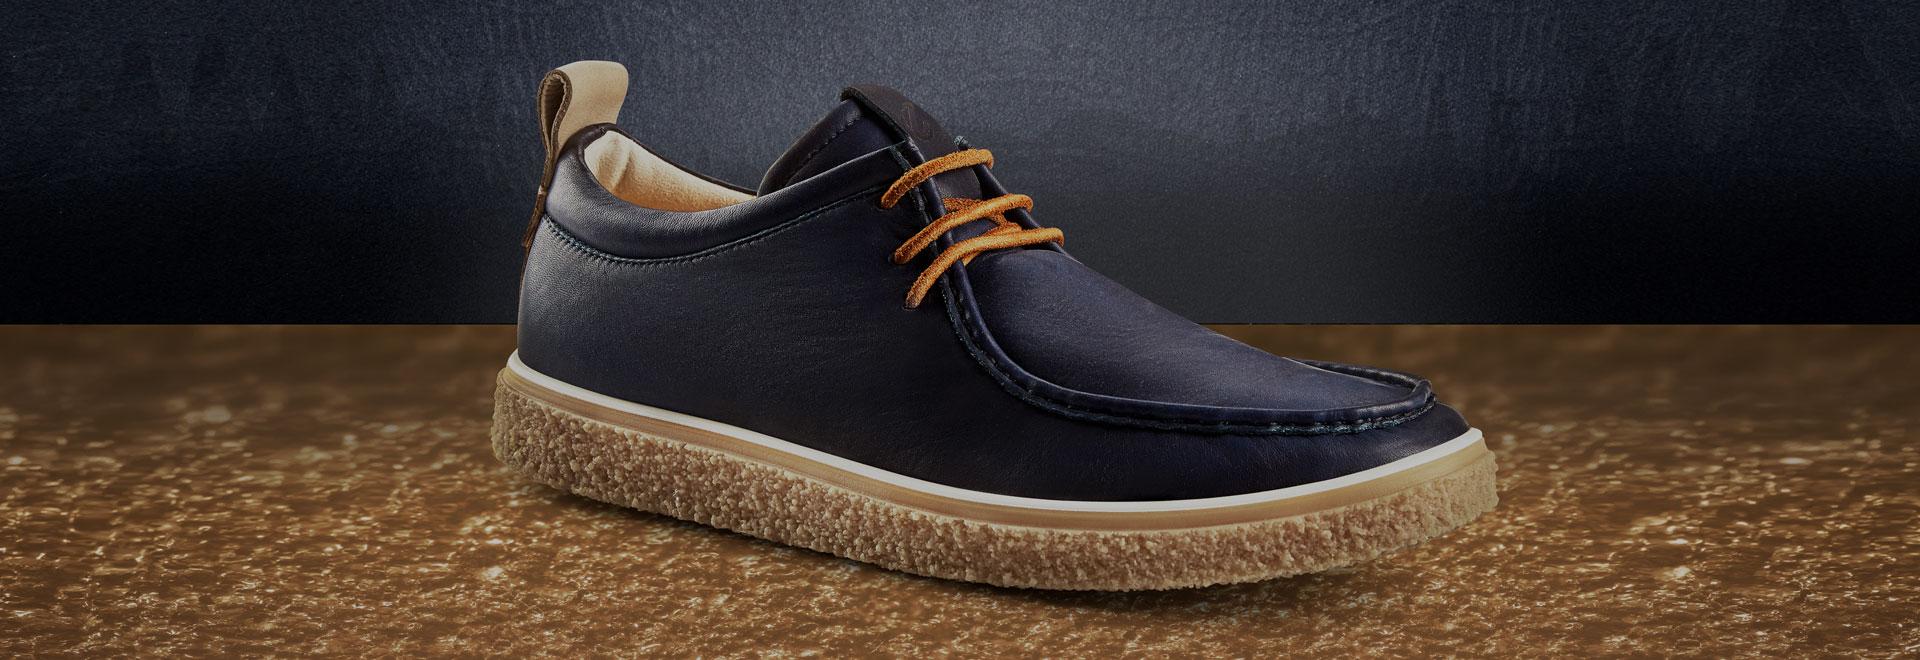 ECCO is a global leader in innovative comfort footwear for men, ladies and  kids. - ECCO.com !